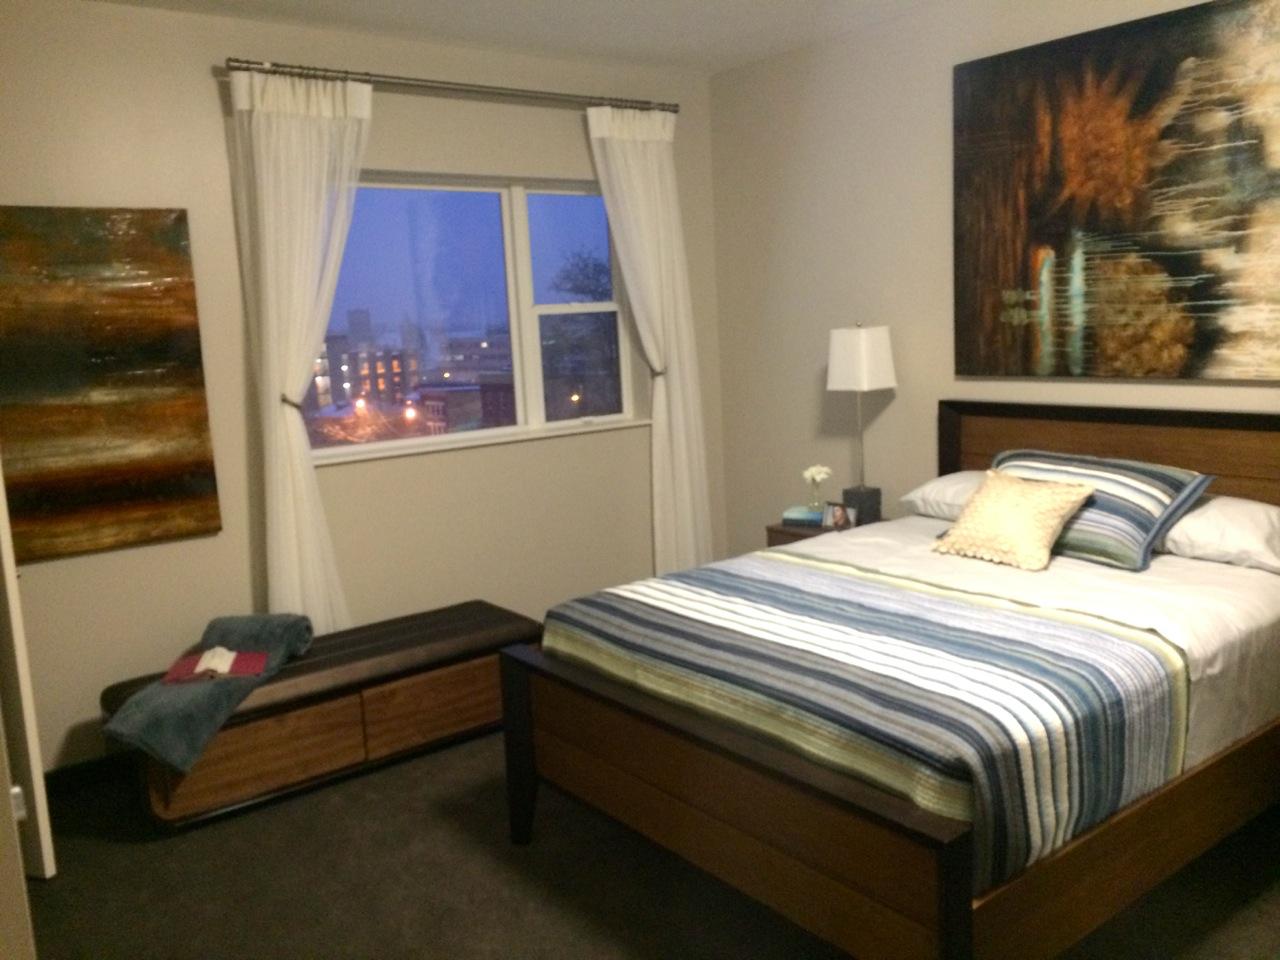 Seneca_Way_Apartments_Ithaca_02141425